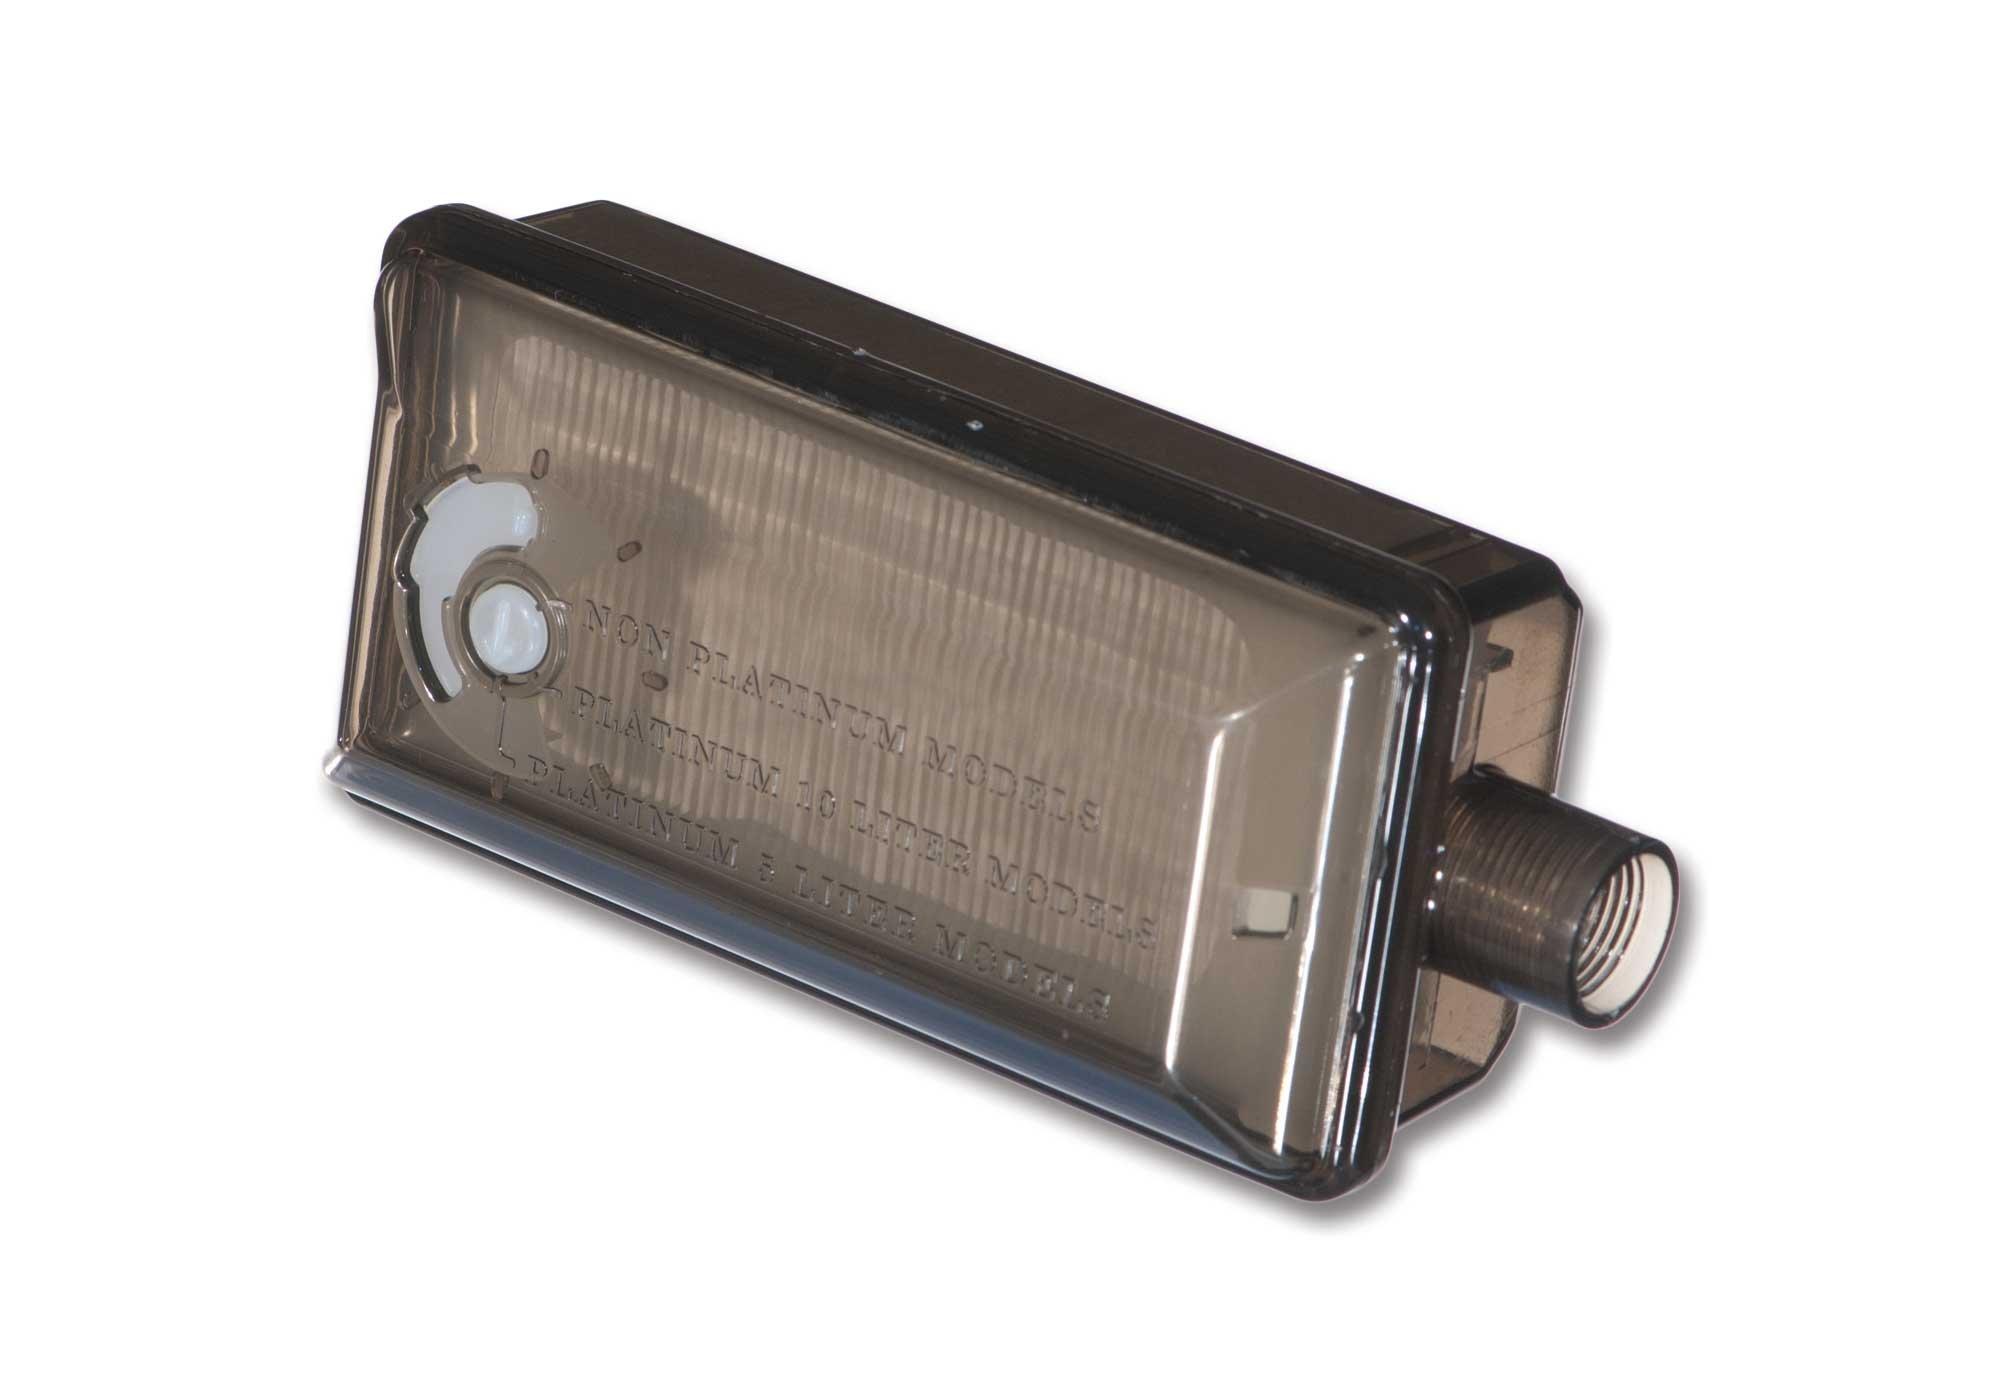 Invacare Care Universal Compressor Filter